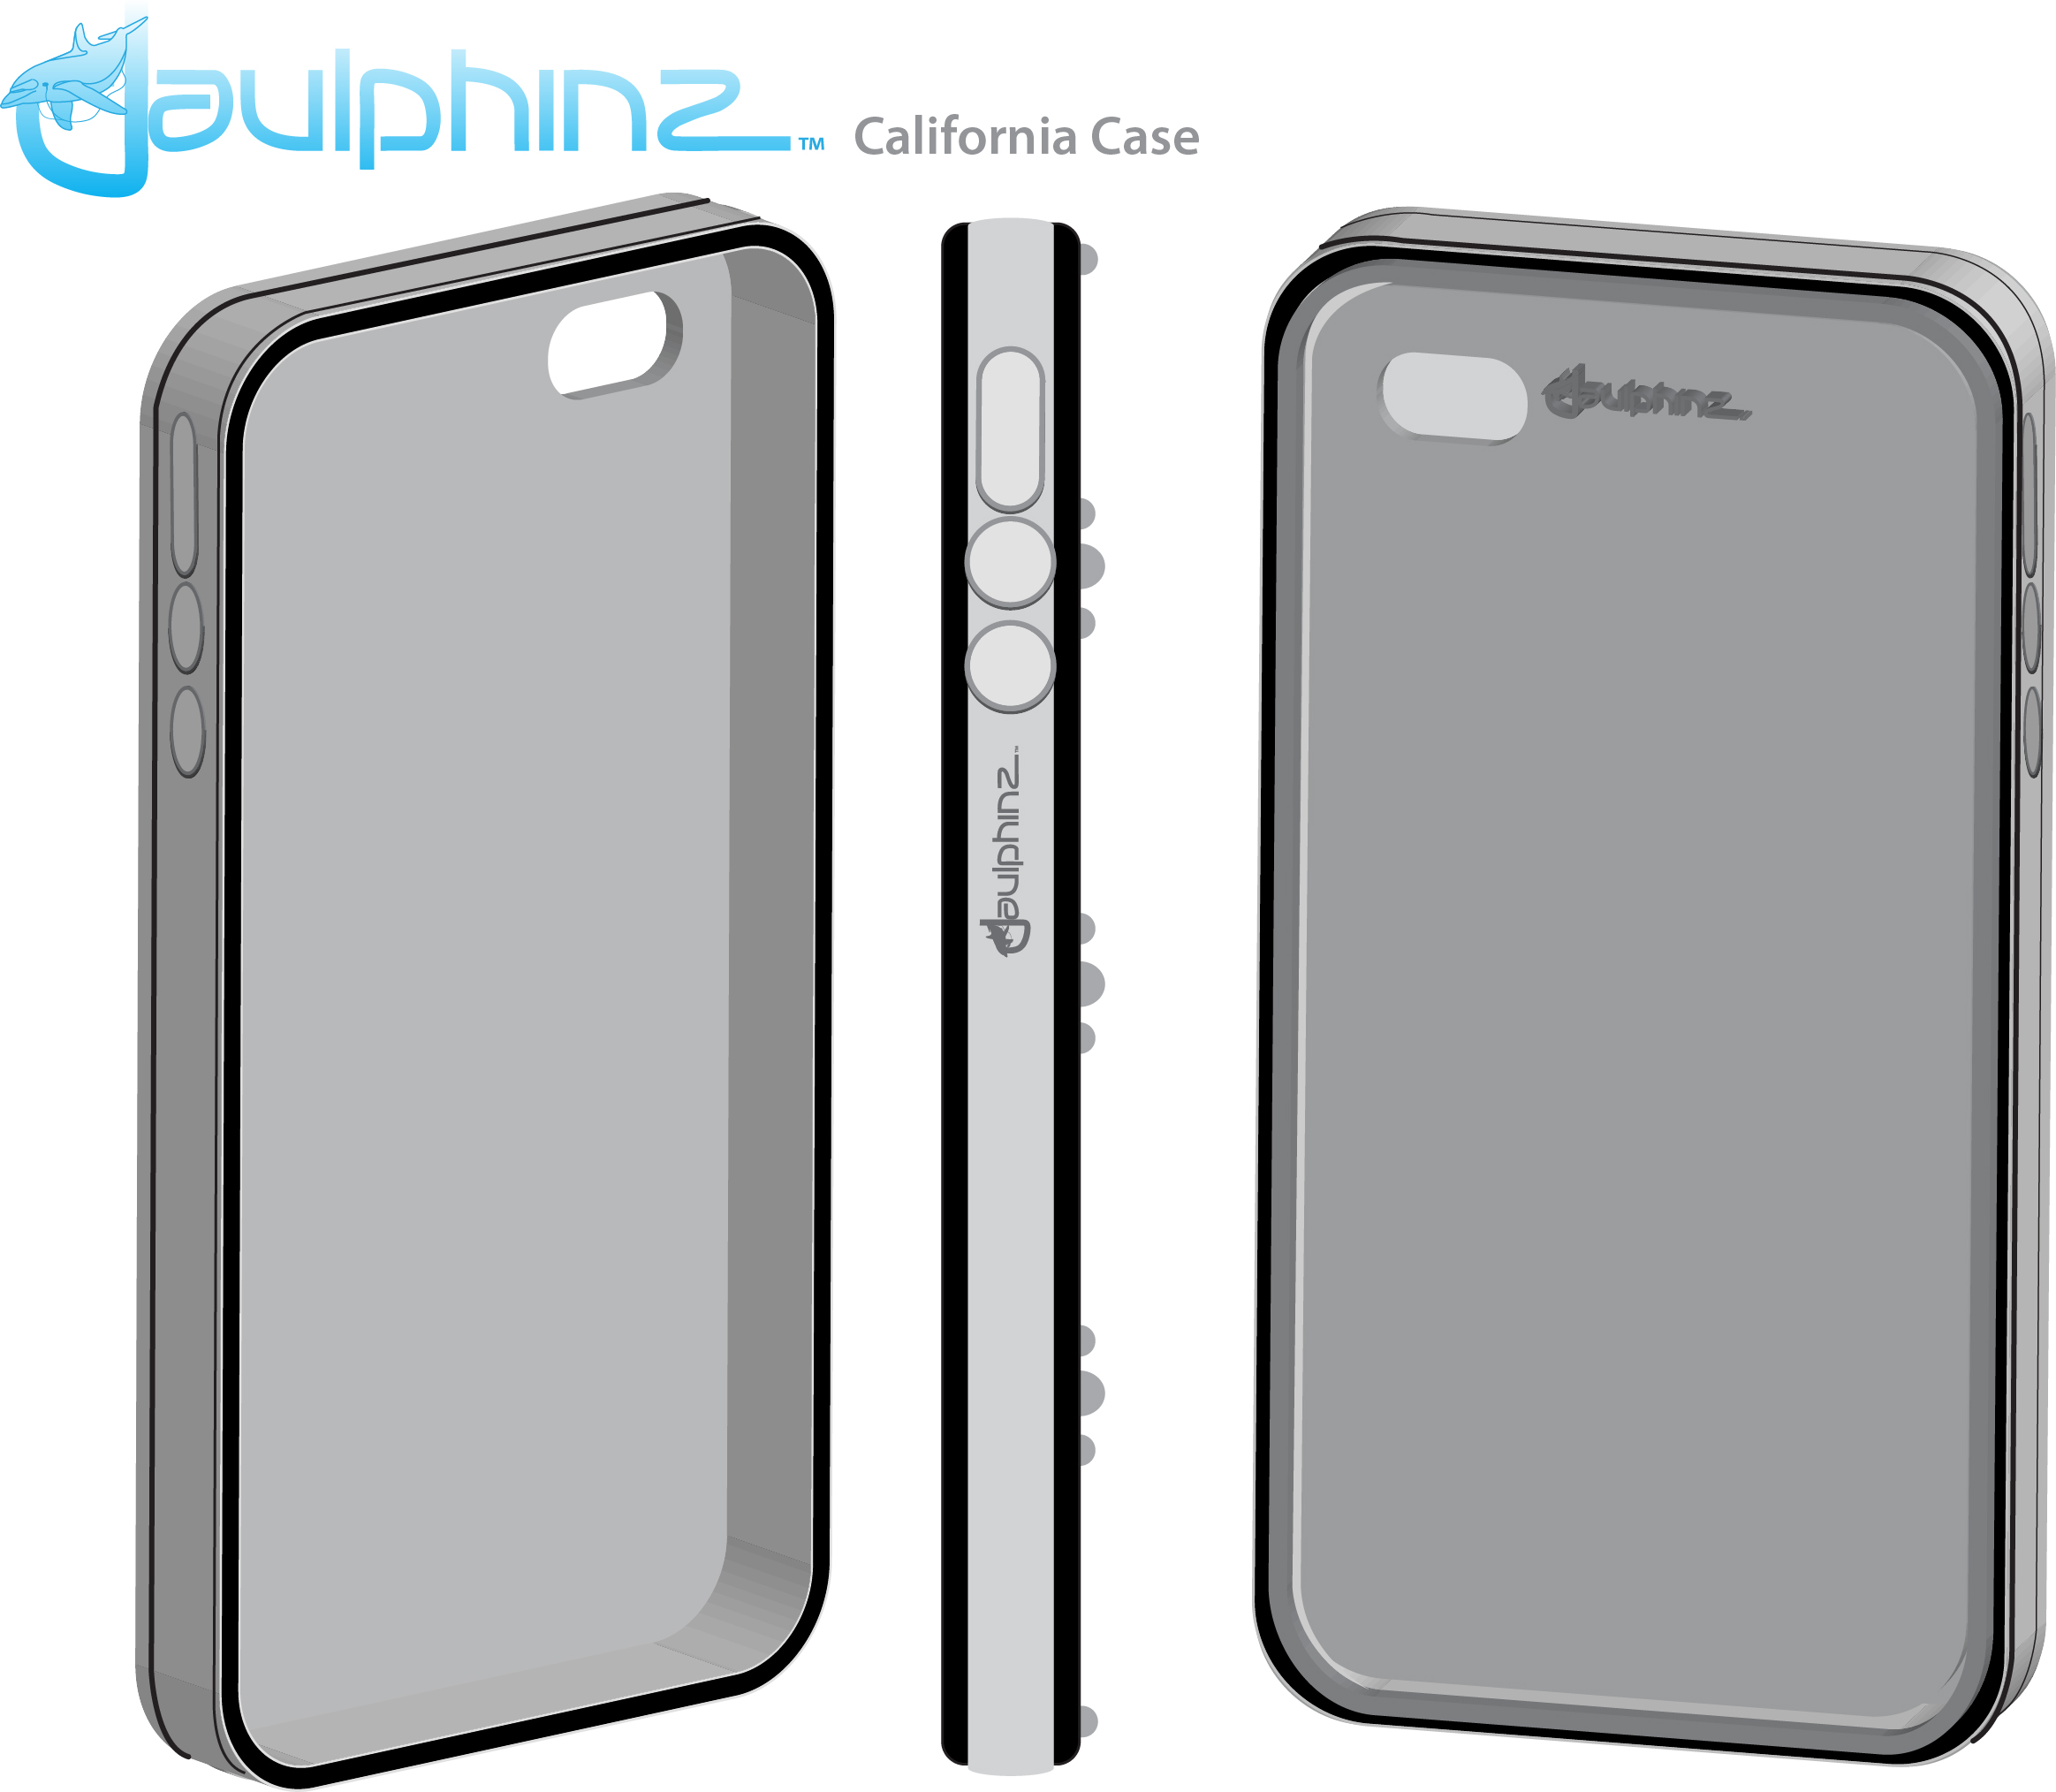 IPHONE4S CASE-3D MODEL.jpg